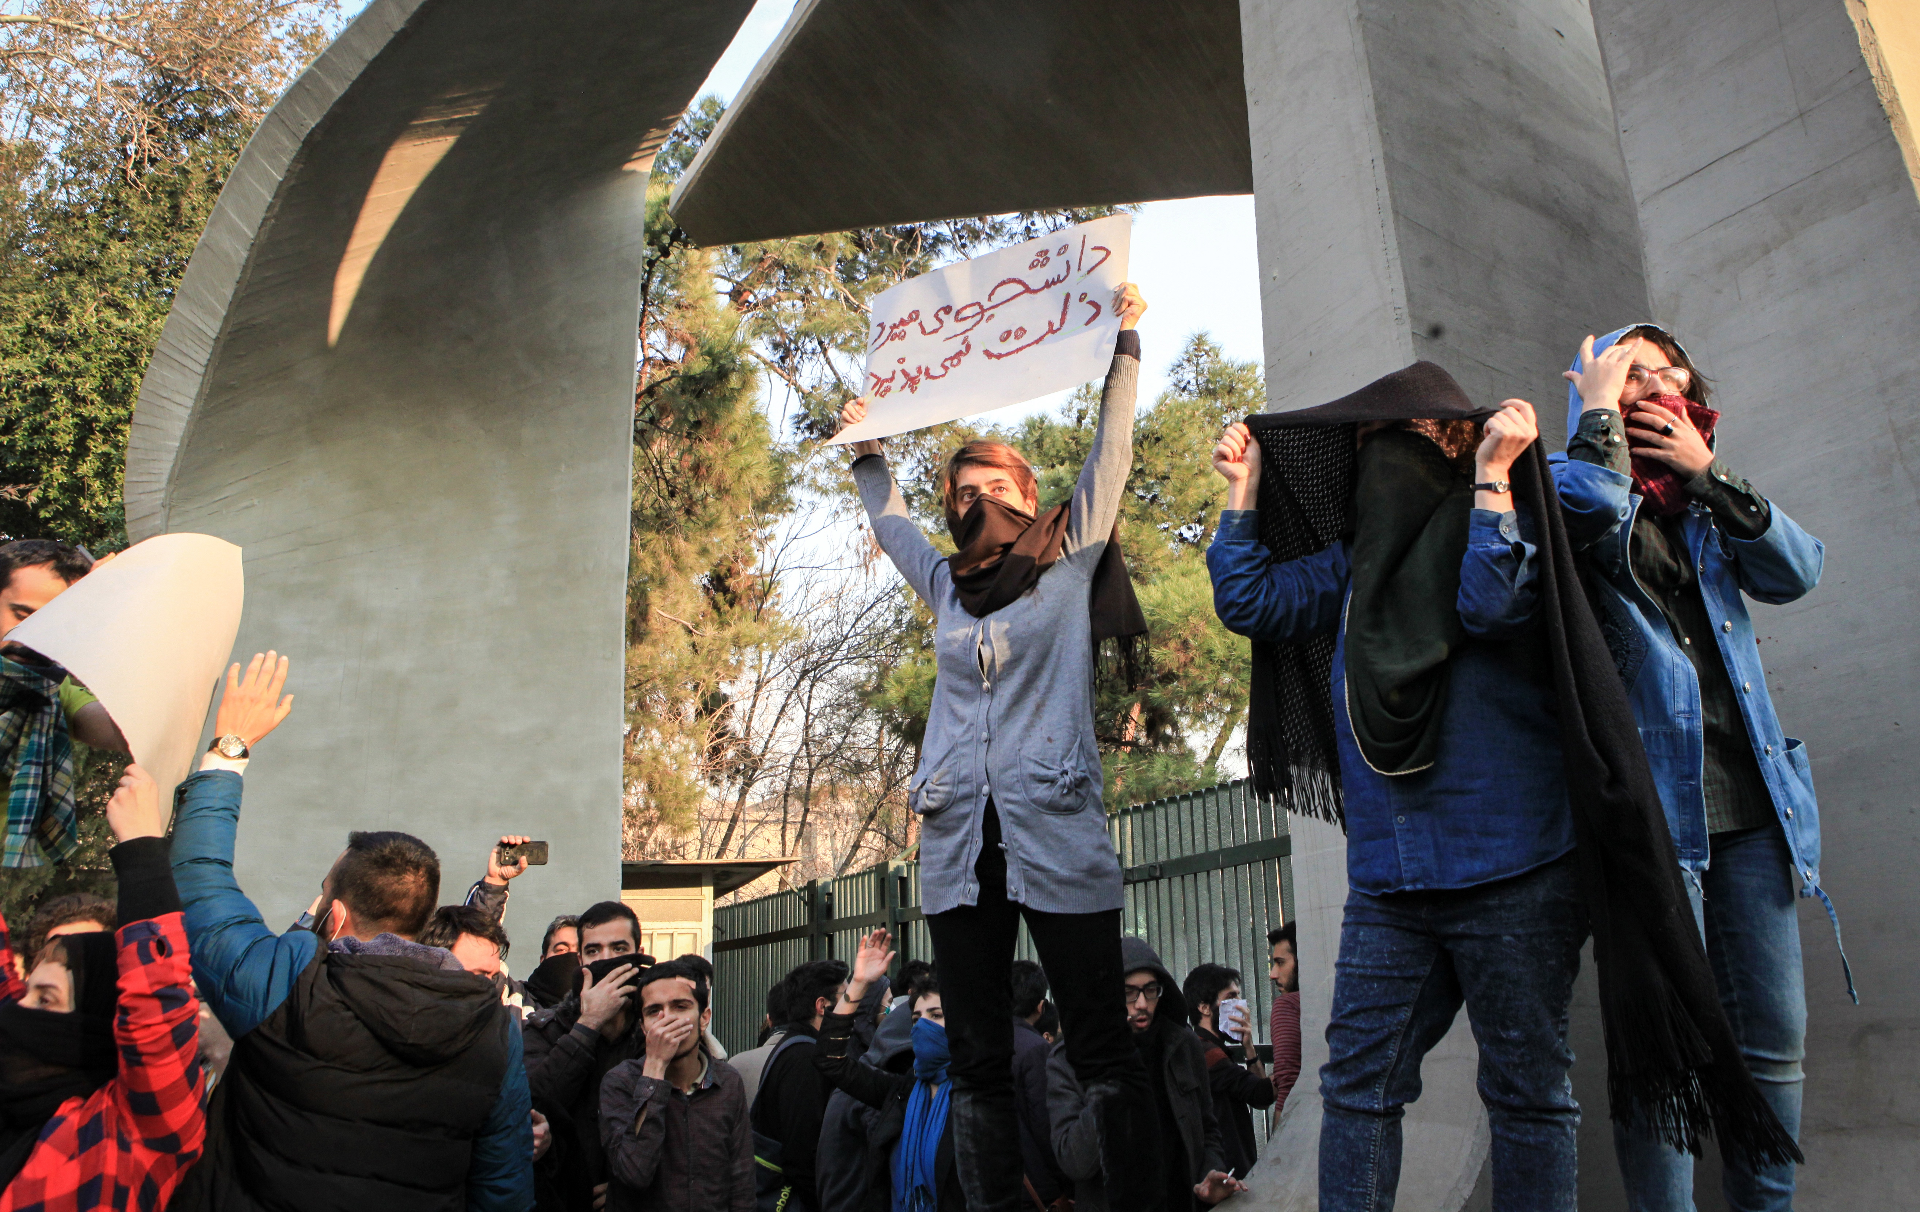 Turkey expresses concerns over Iran anti-govt protests